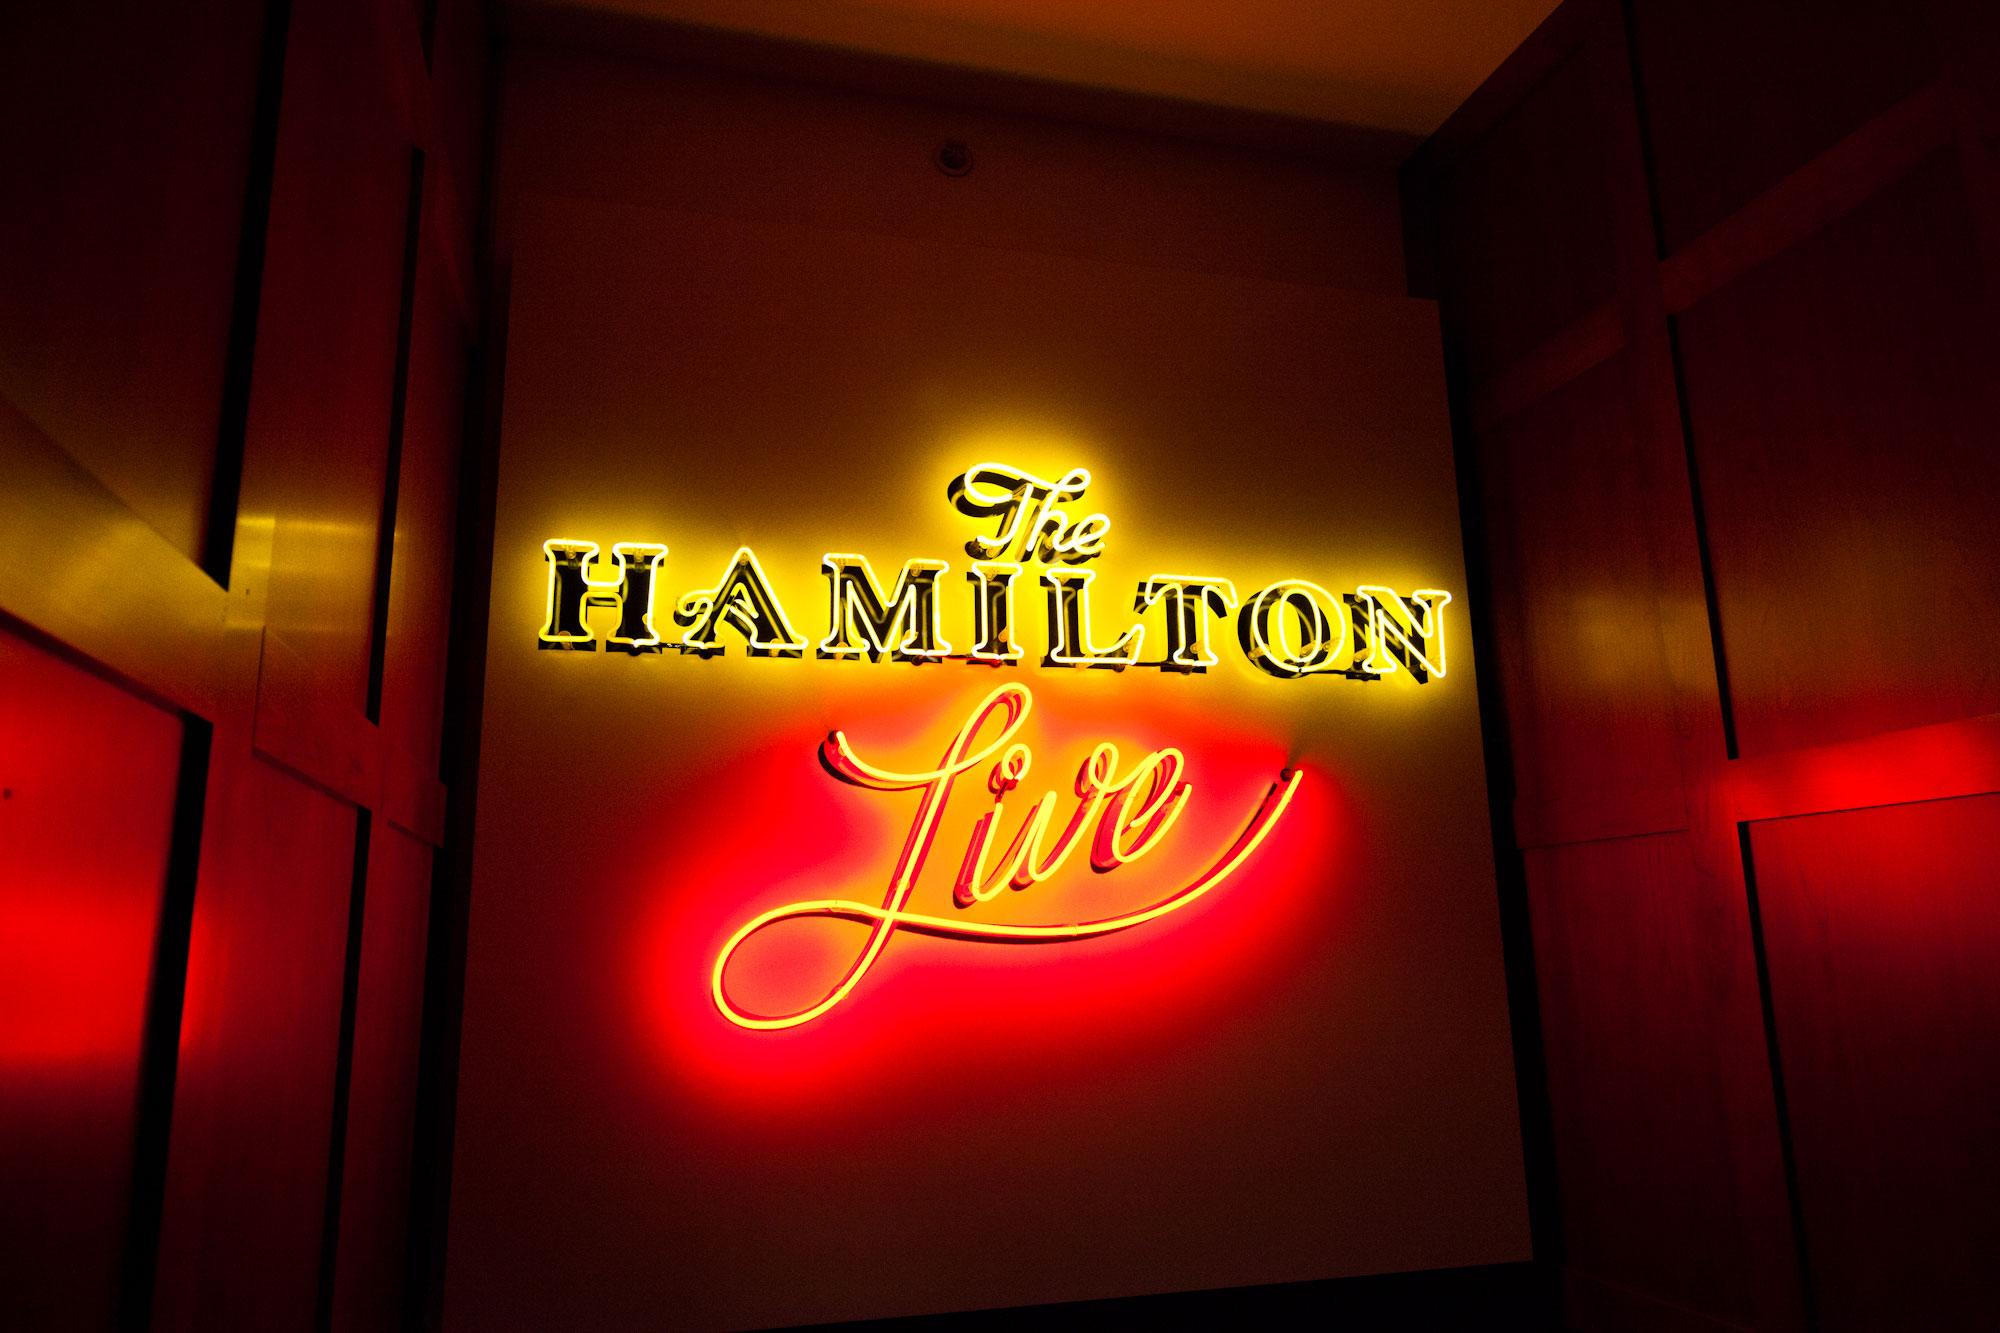 HAMILTON_neighborhood_SMALL1